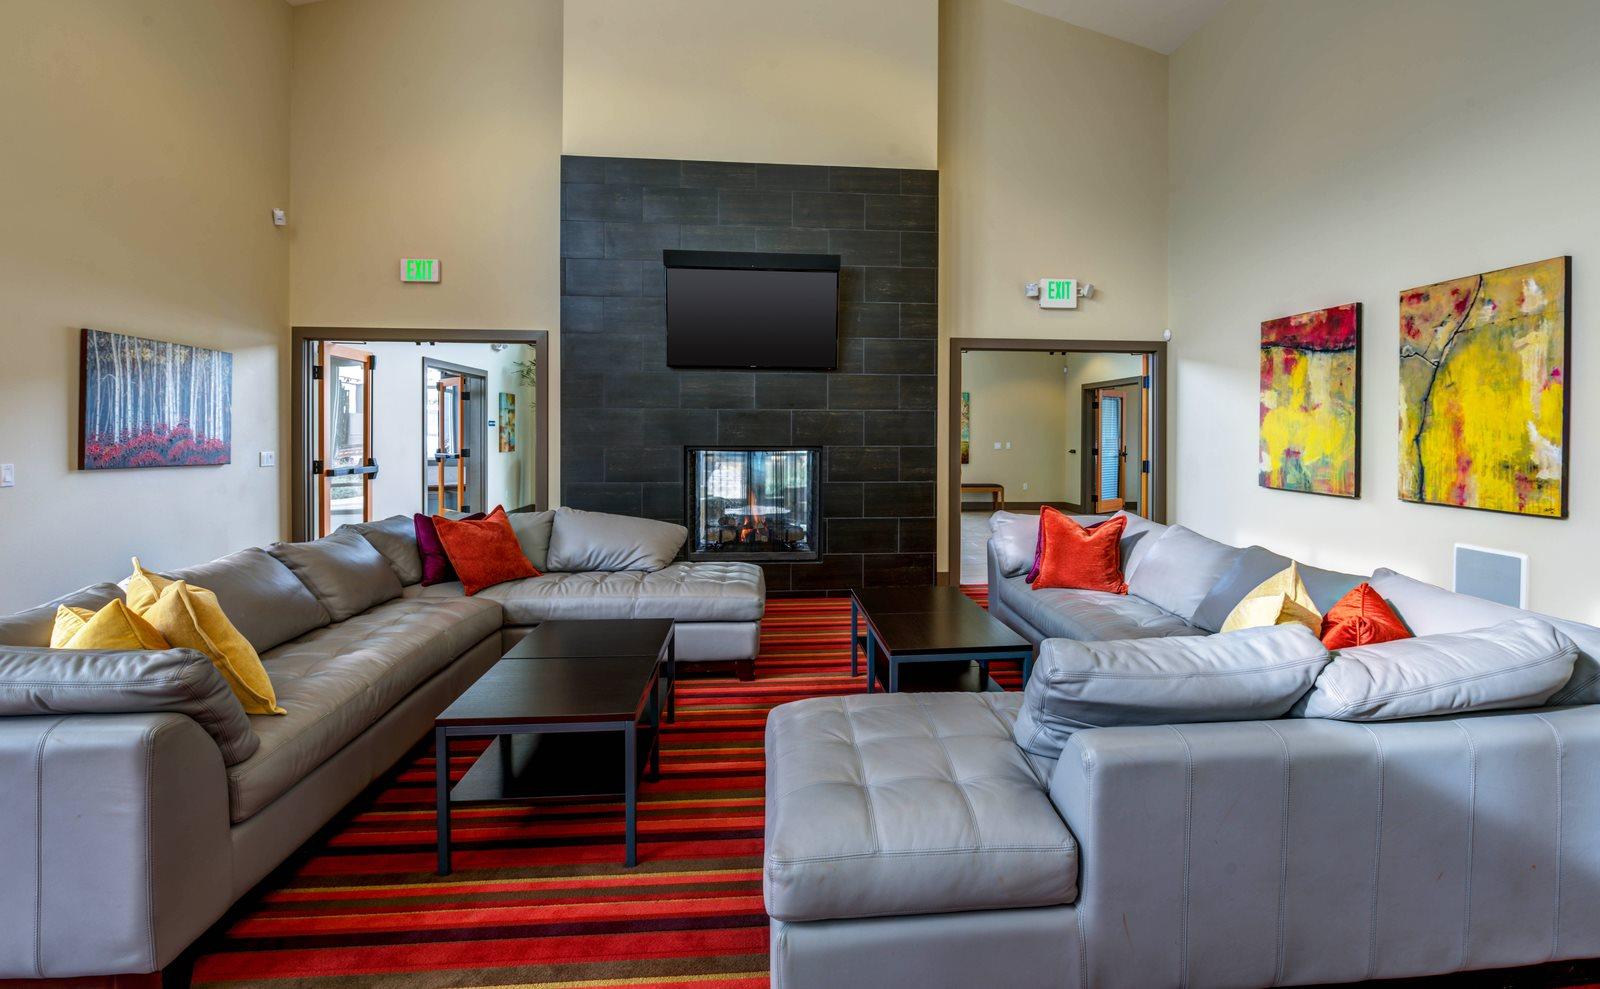 Lush Wall-to-Wall Carpeting Altia Apartments, Lynnwood, WA,98037